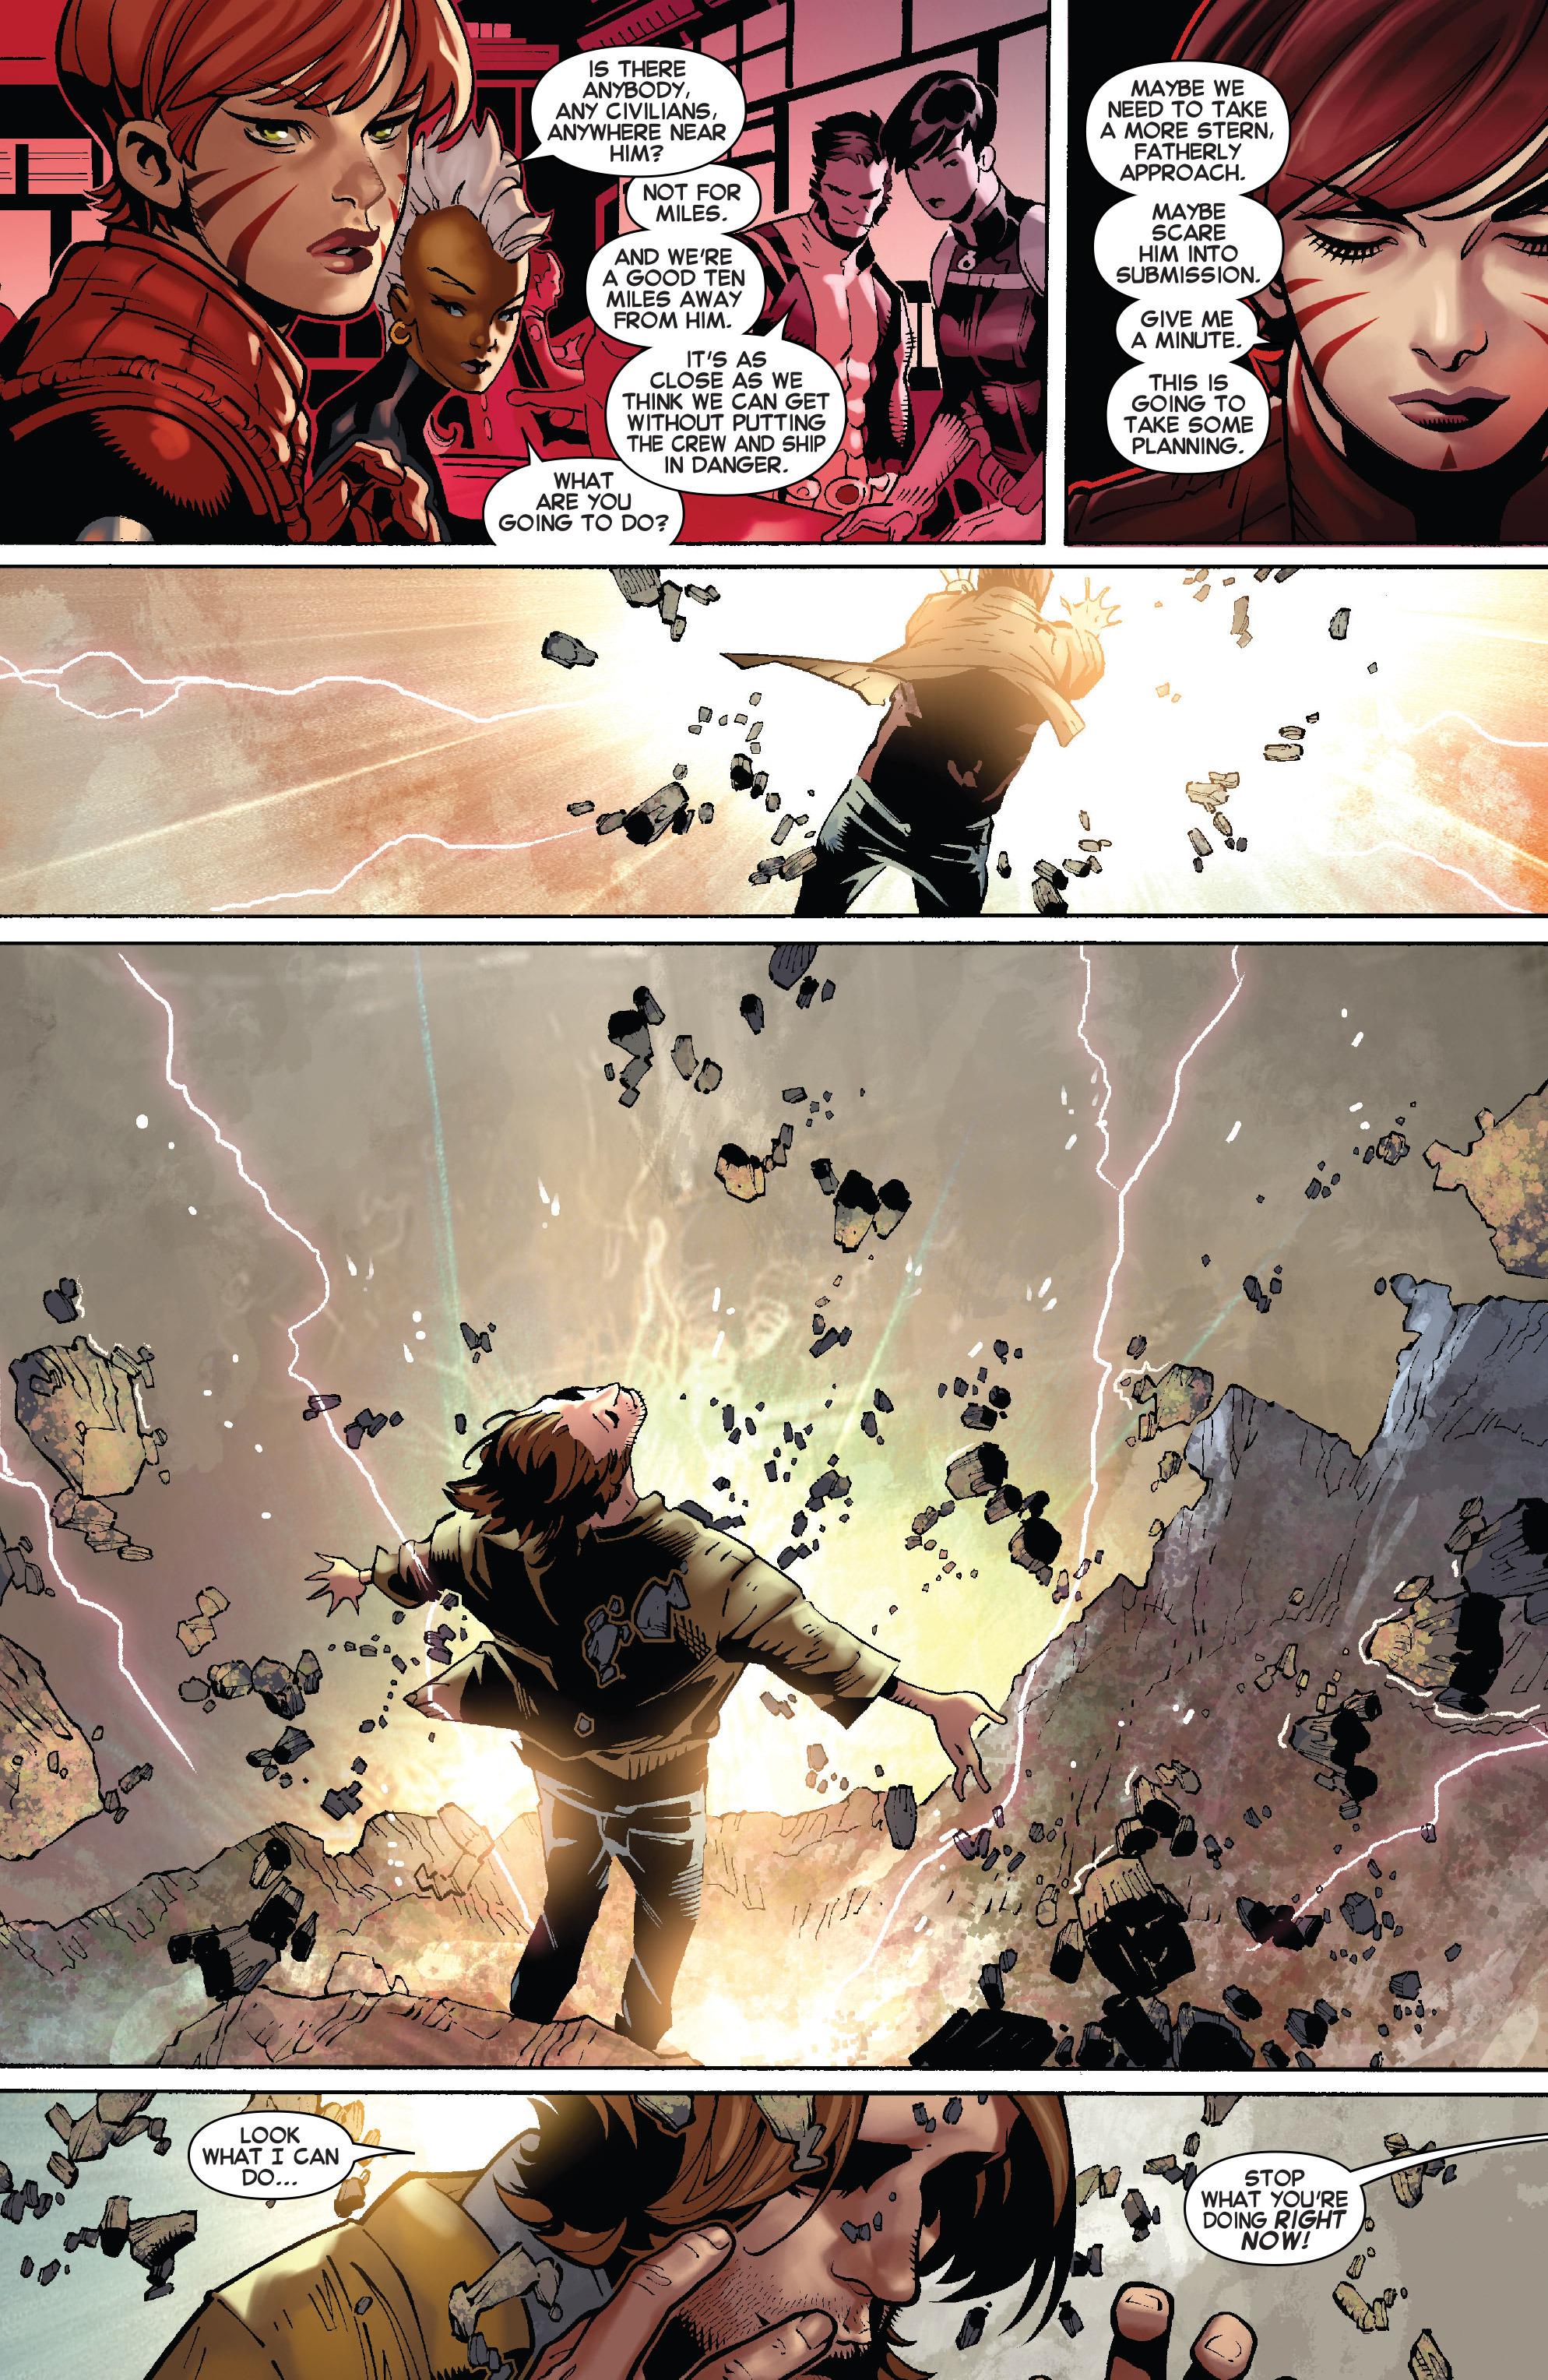 Read online Uncanny X-Men (2013) comic -  Issue # _TPB 5 - The Omega Mutant - 24